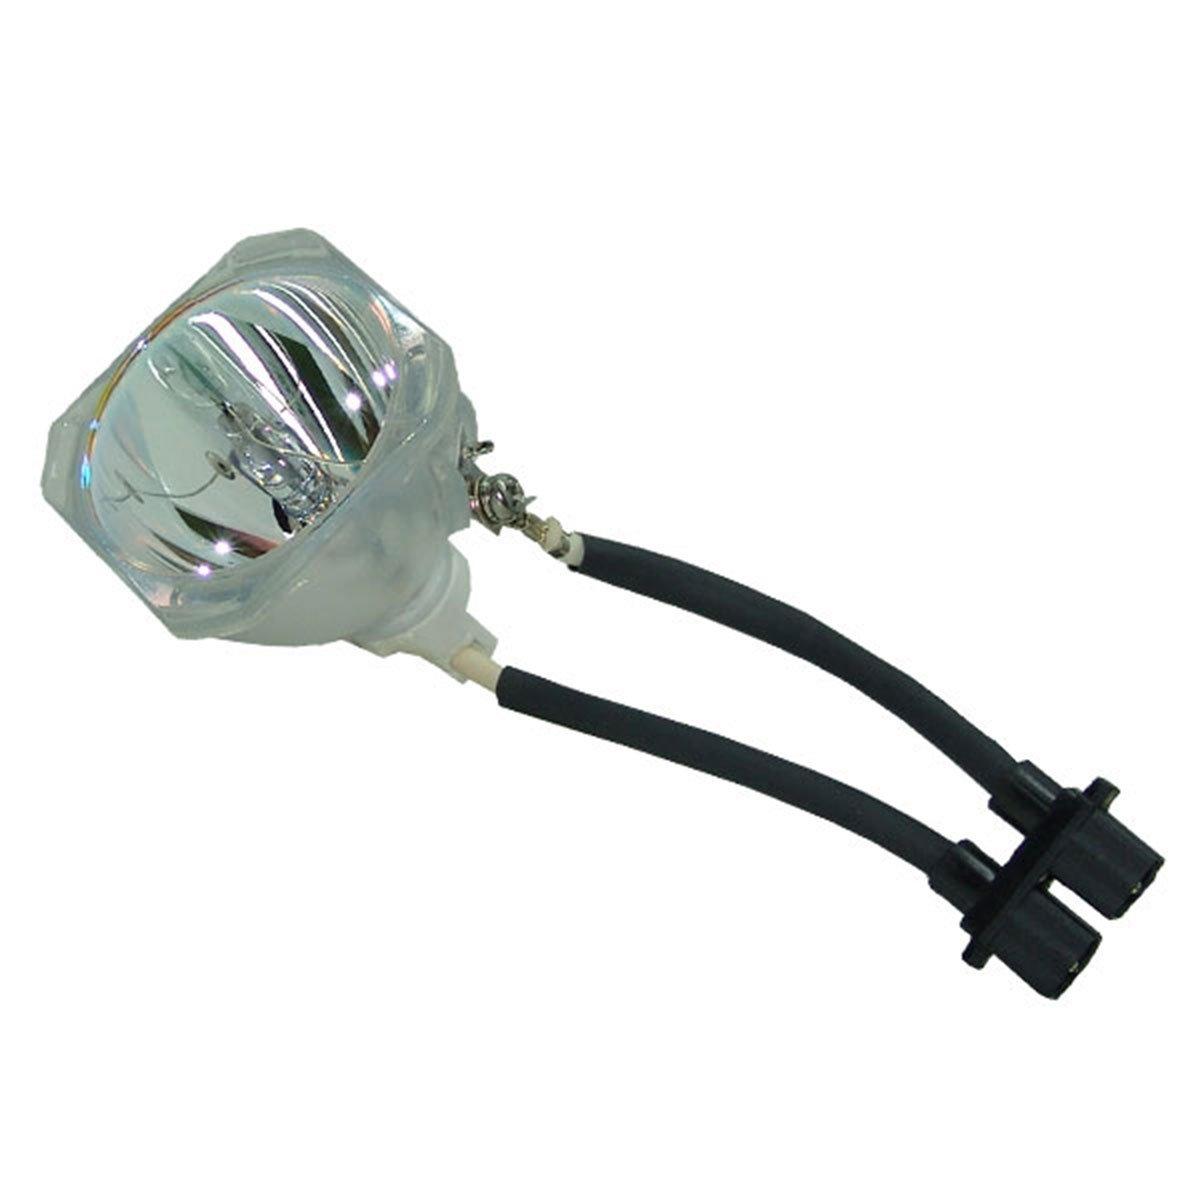 SpArc OEM プロジェクター交換用ランプ 囲い/電球付き Optoma HD70用 Platinum (Brighter/Durable) B07MPRRCZV Lamp Only Platinum (Brighter/Durable)